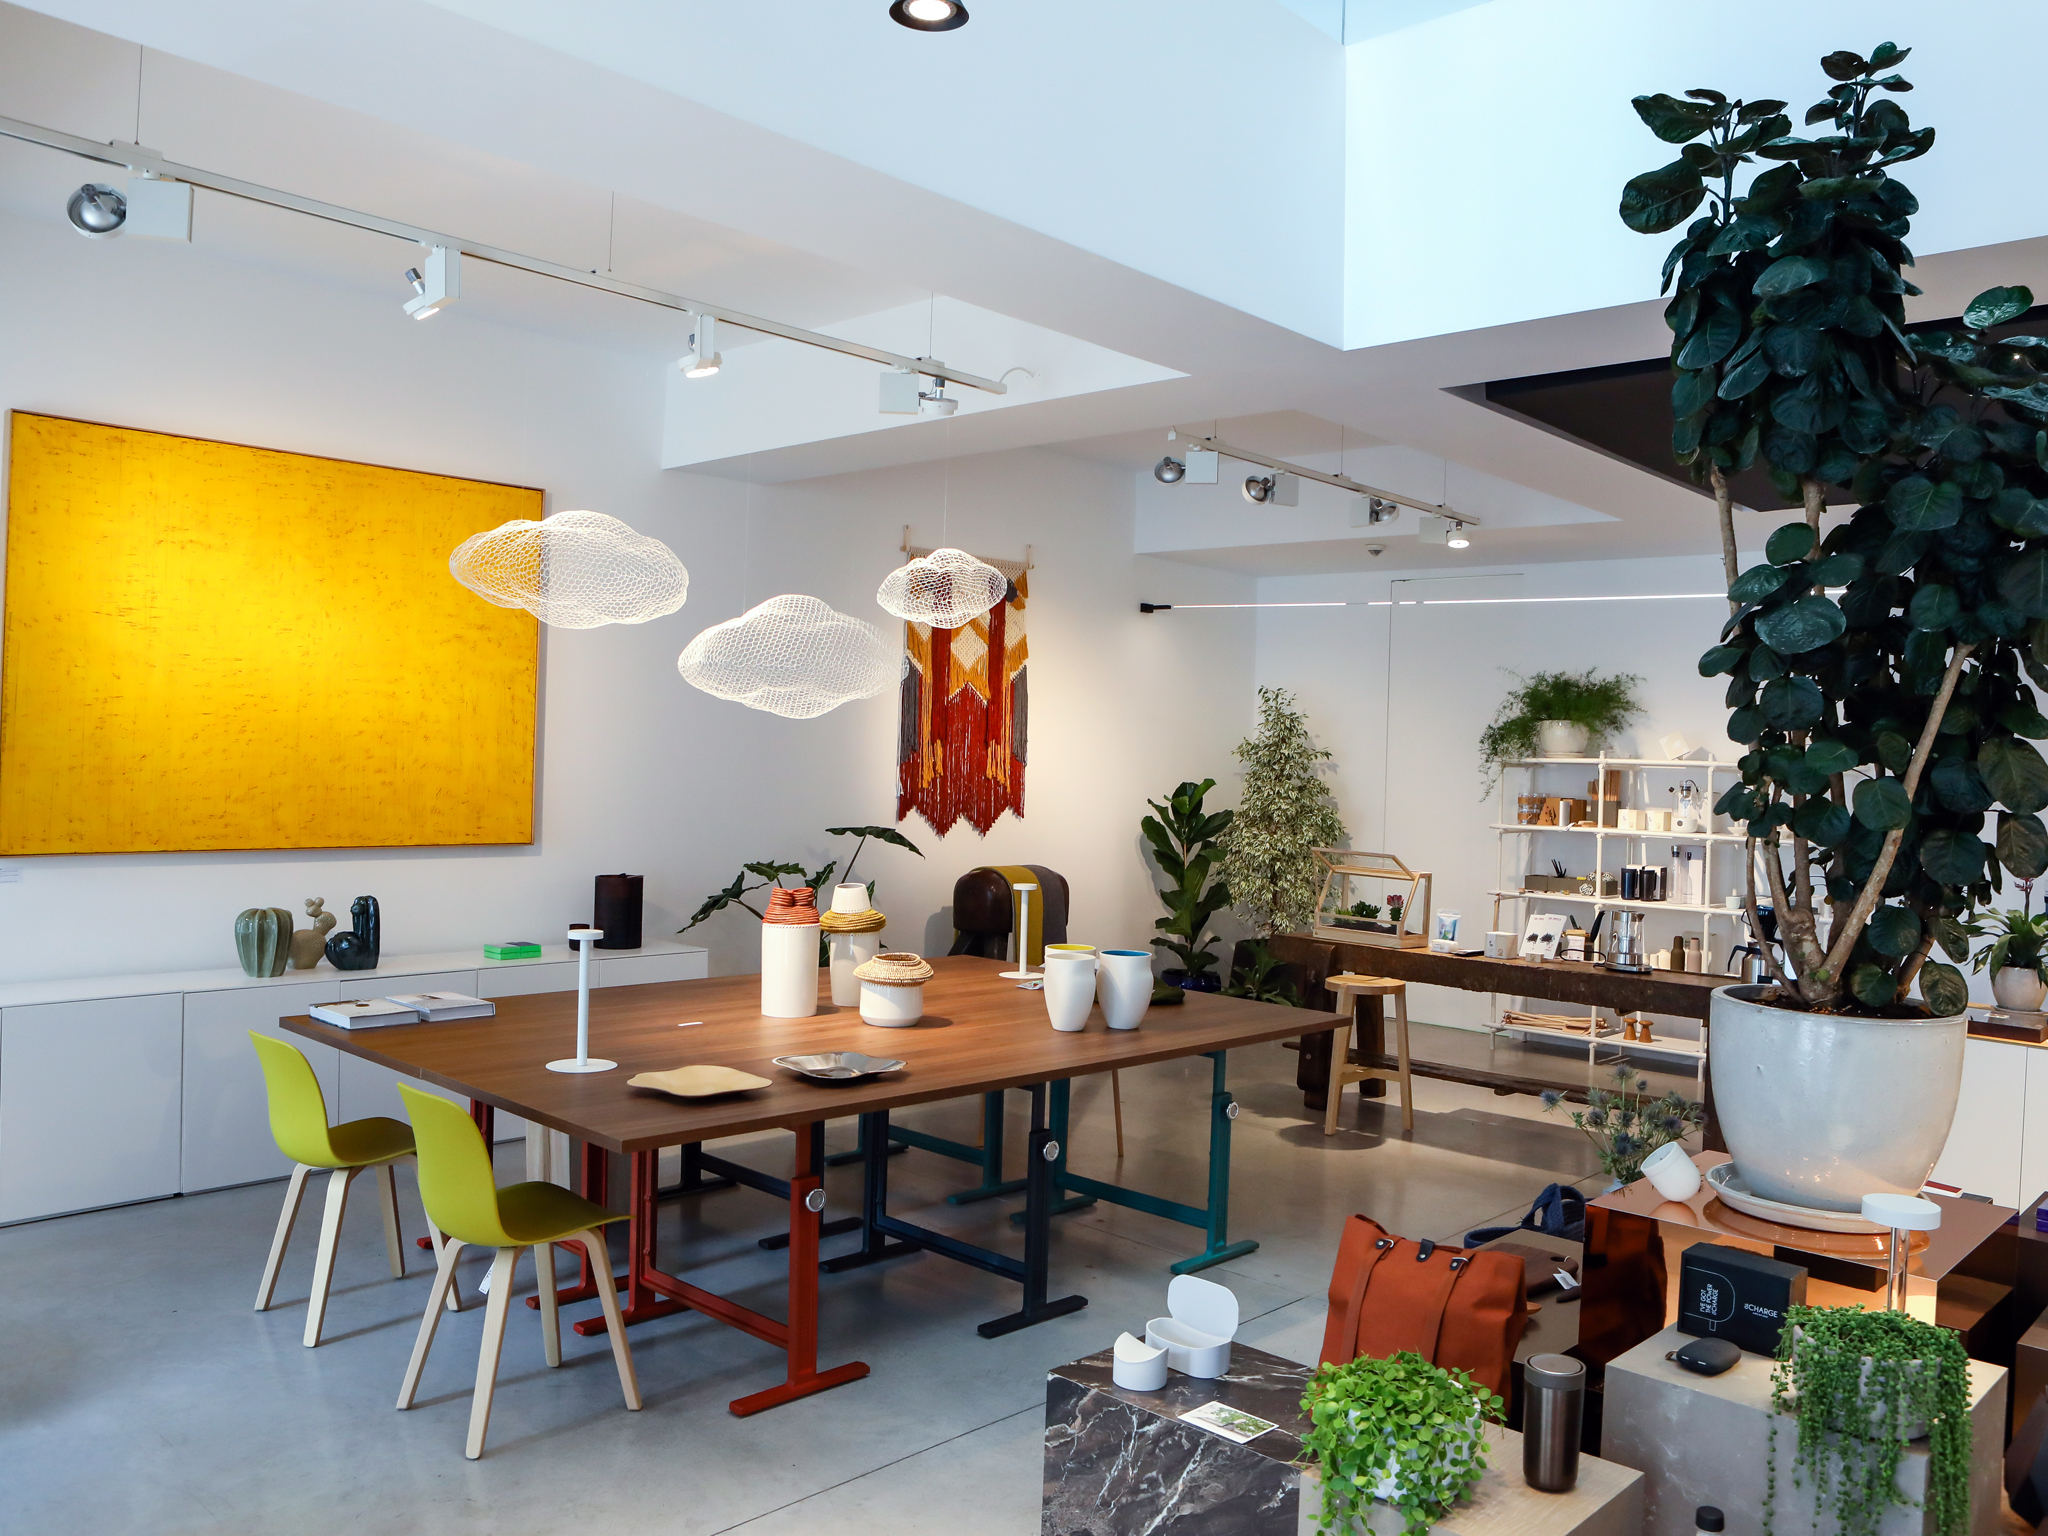 Lojas Banema Studio recebem pop-up da editora alemã Gestalten